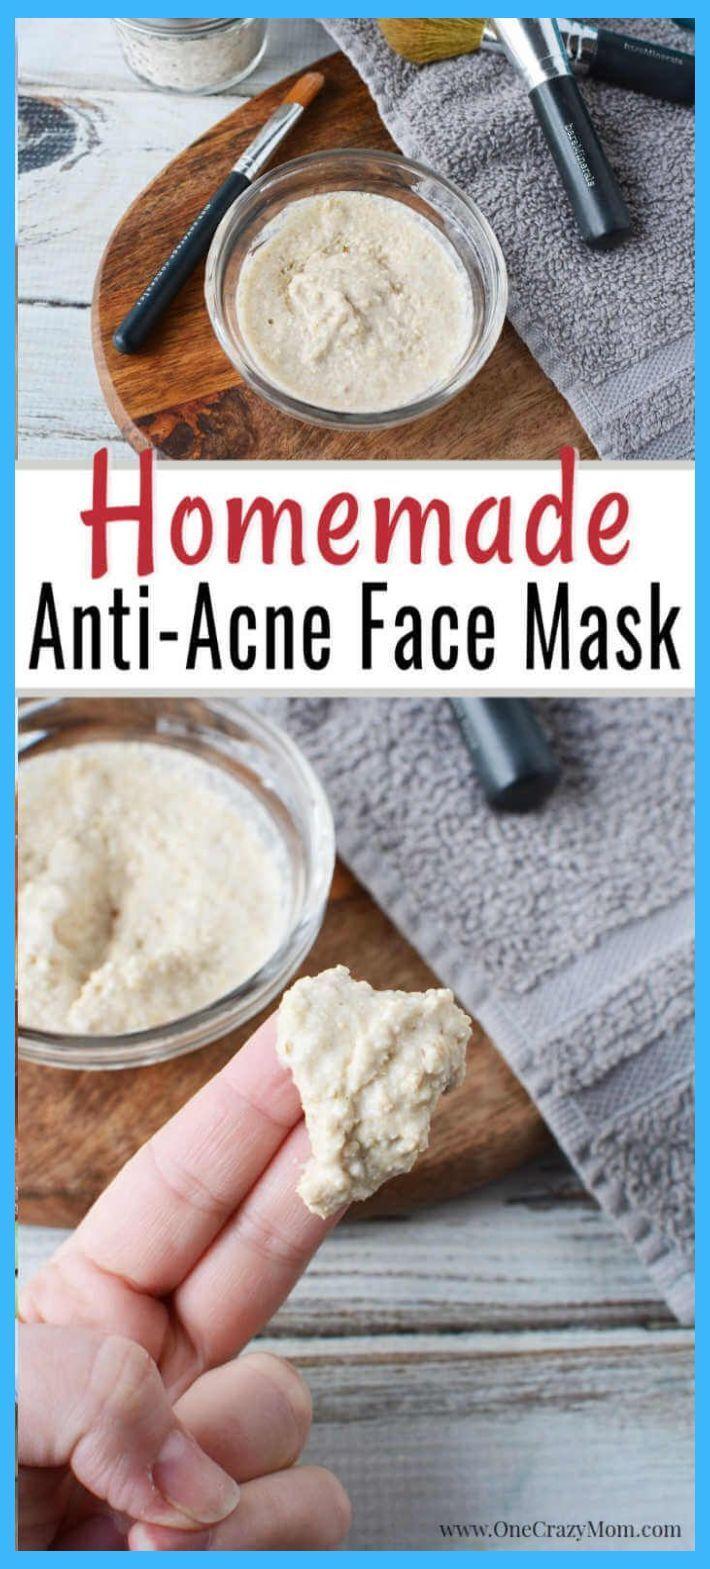 Homemade Face Mask for Acne  Diy Acne Face Mask  Honey Face Mask For Acne  Homemade Face M  Homemade Face Mask for Acne  Diy Acne Face Mask  Honey Face Mask For Acne  Hom...